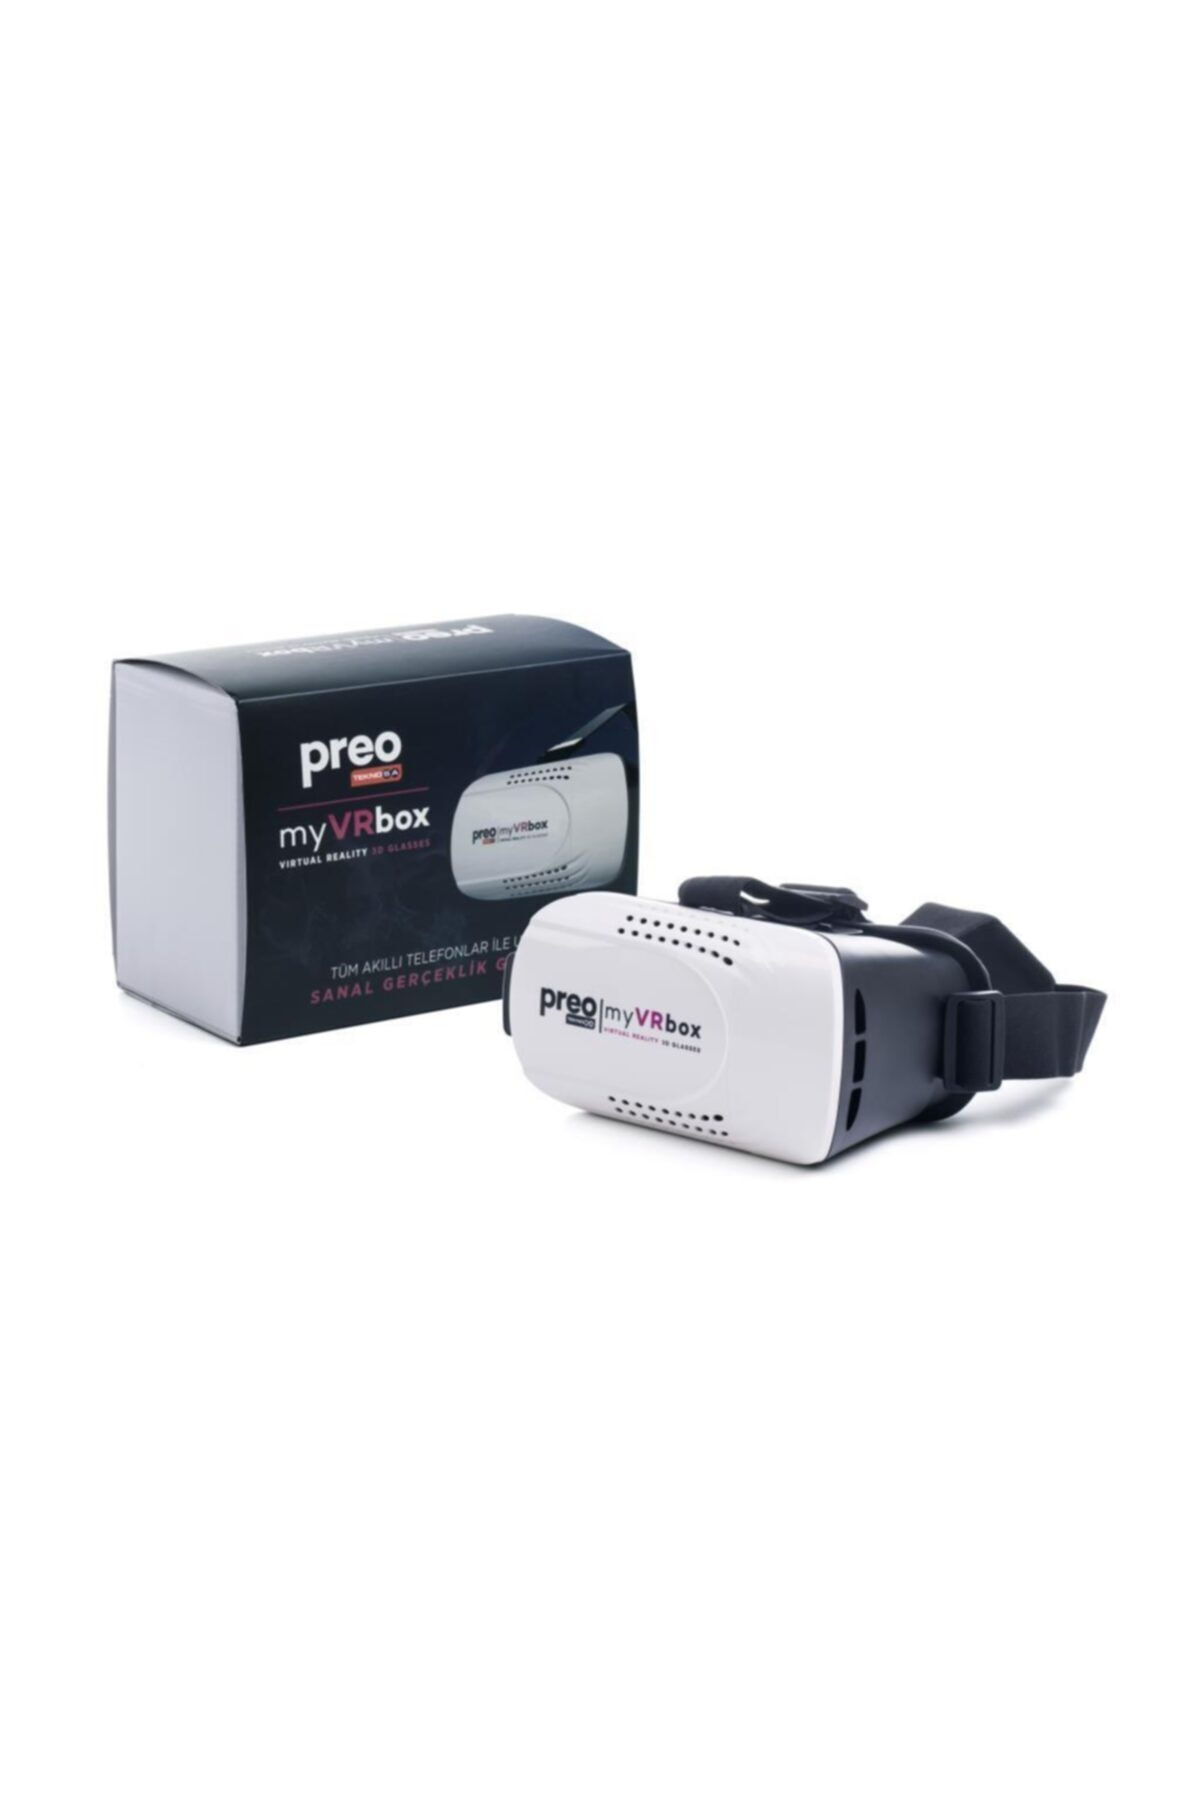 Preo My Vr Box Vb01 Sanal Gerçeklik Gözlüğü 1